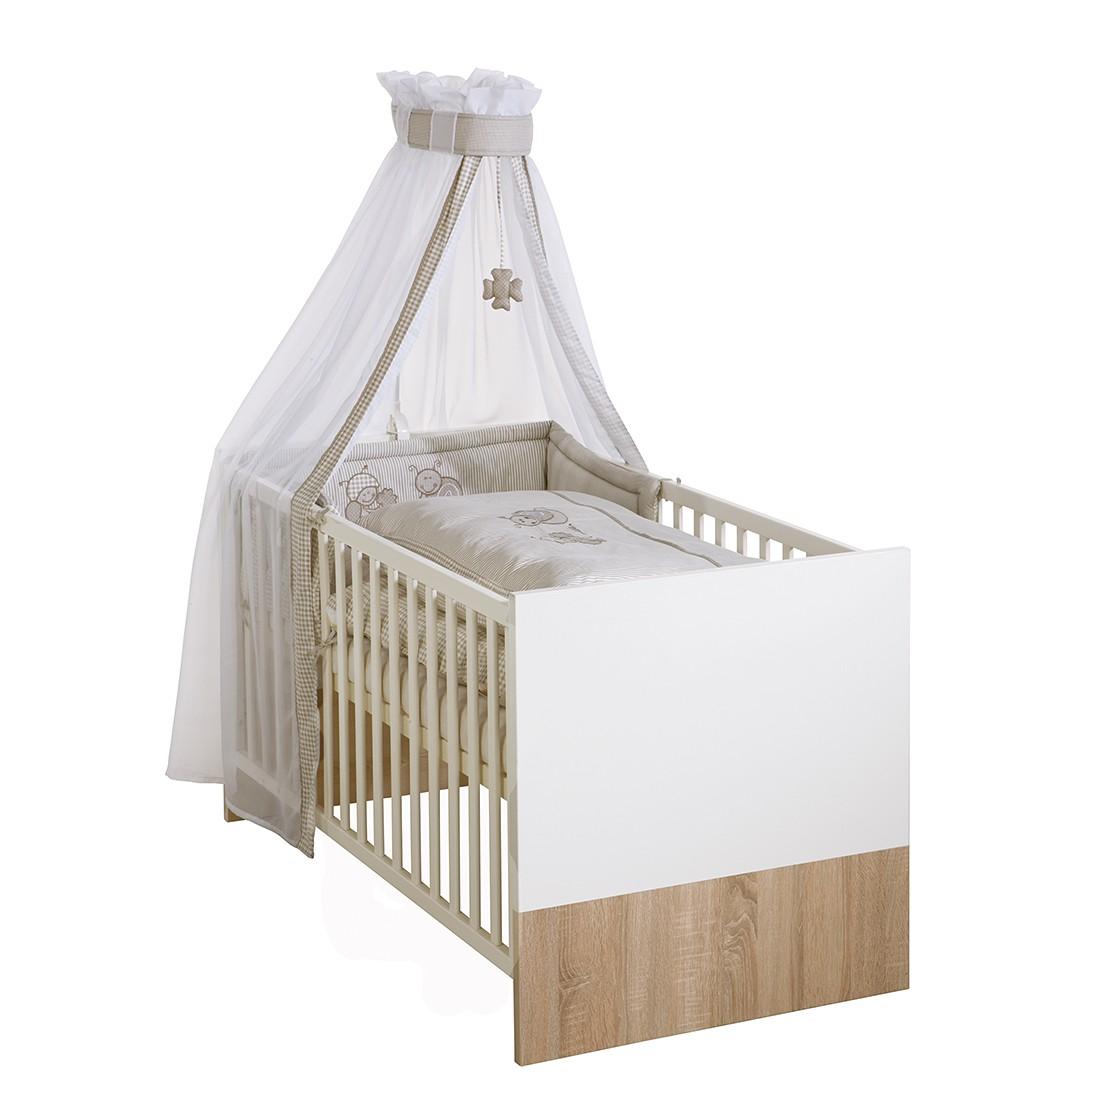 Kombi-Kinderbett Ancona - Eiche Sägerau Dekor / Weiß, Roba